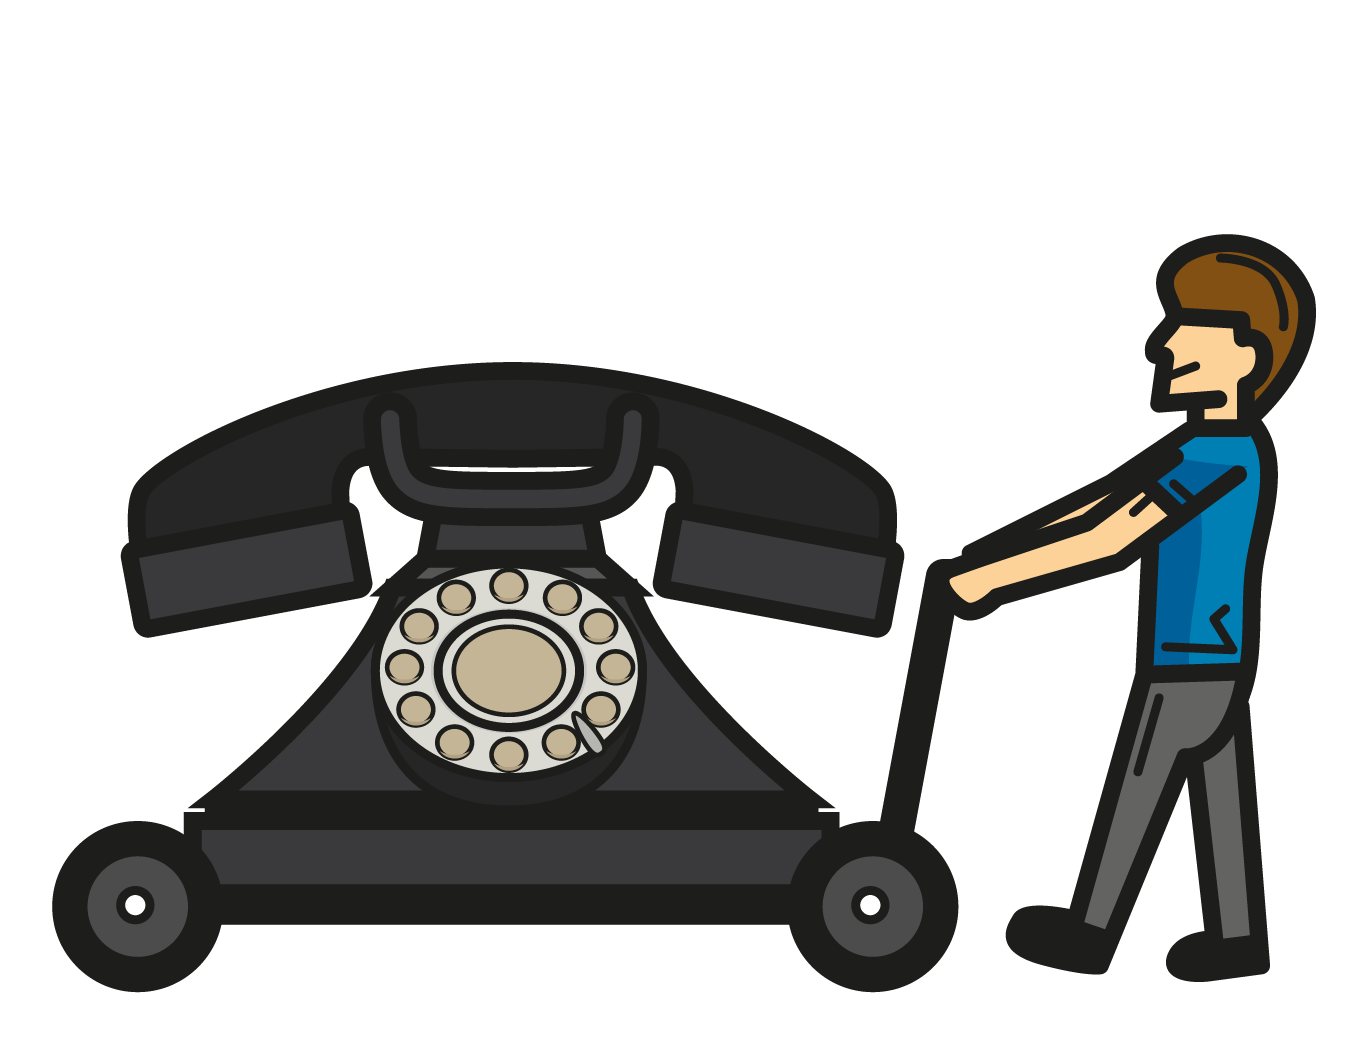 Illustration of man wheeling giant phone